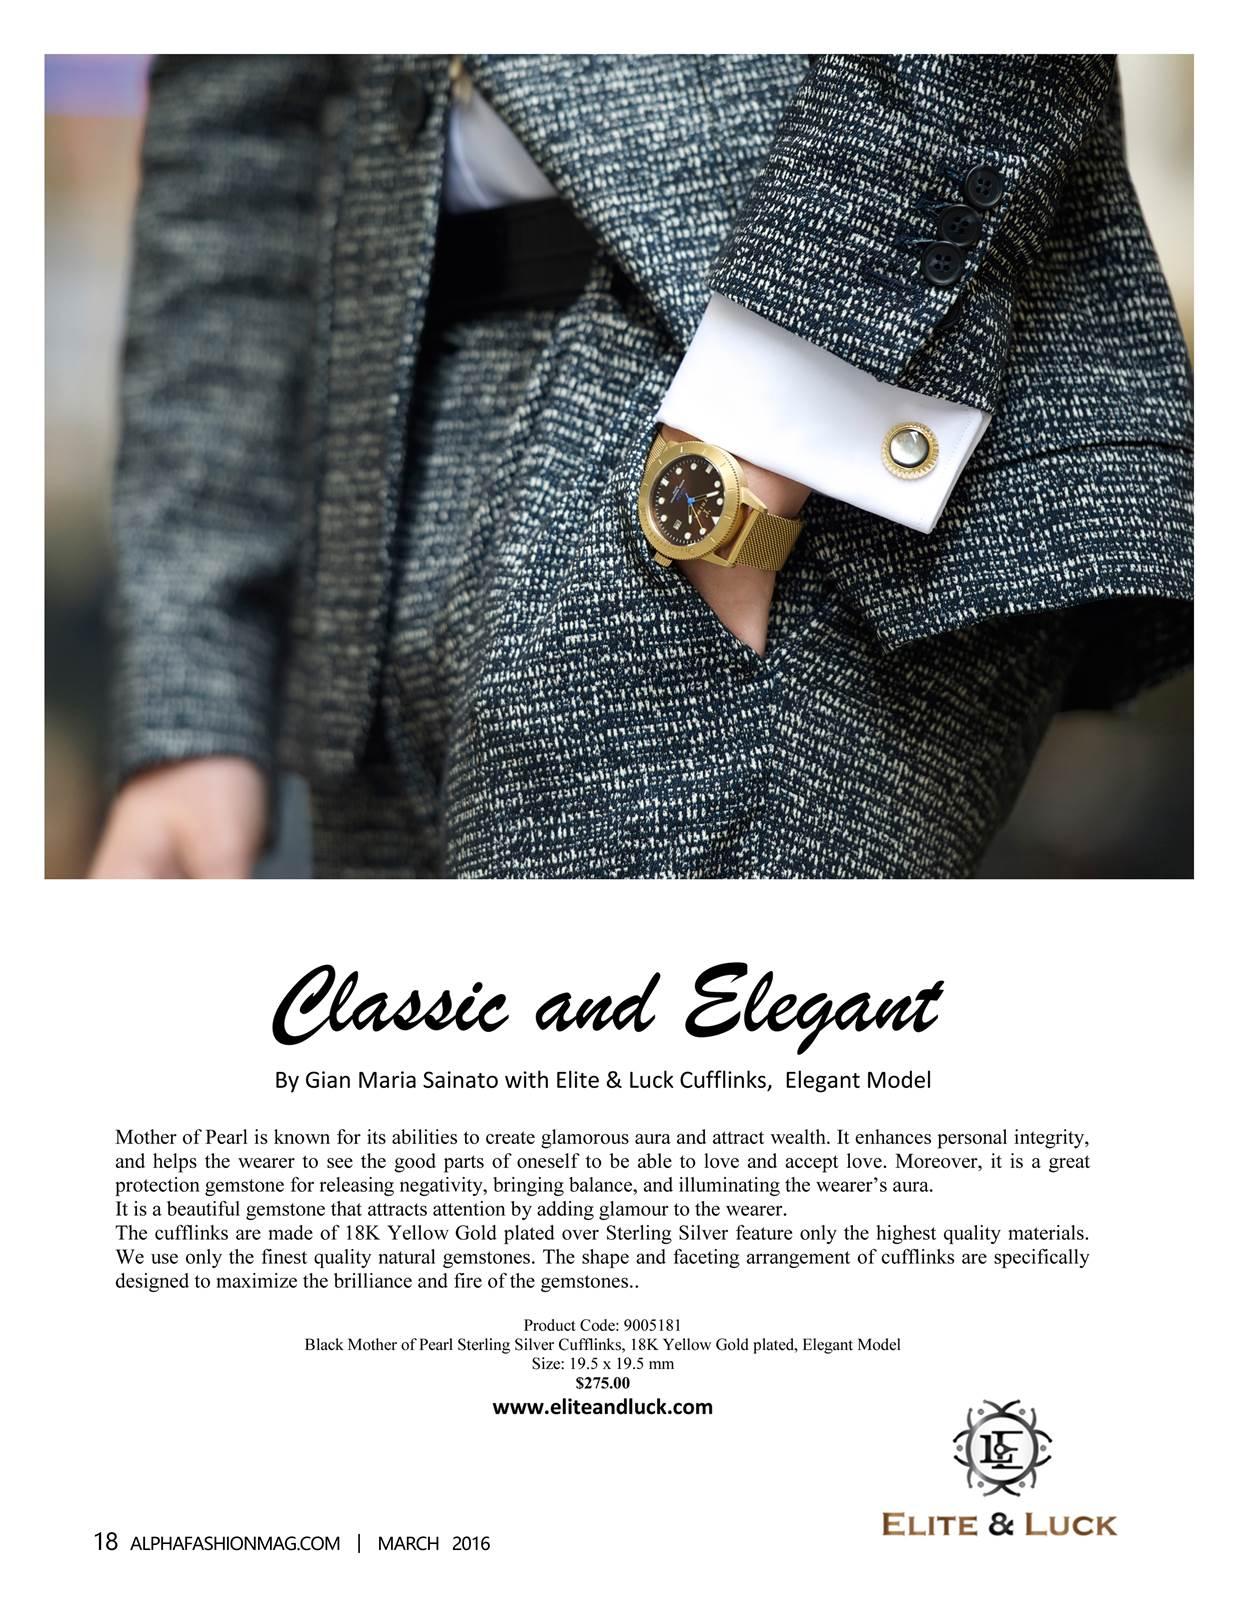 Elite & Luck Cufflinks ในนิตยสาร Alpha Fashion Magazine ที่ New York ฉบับเดือนมีนาคม 2016.